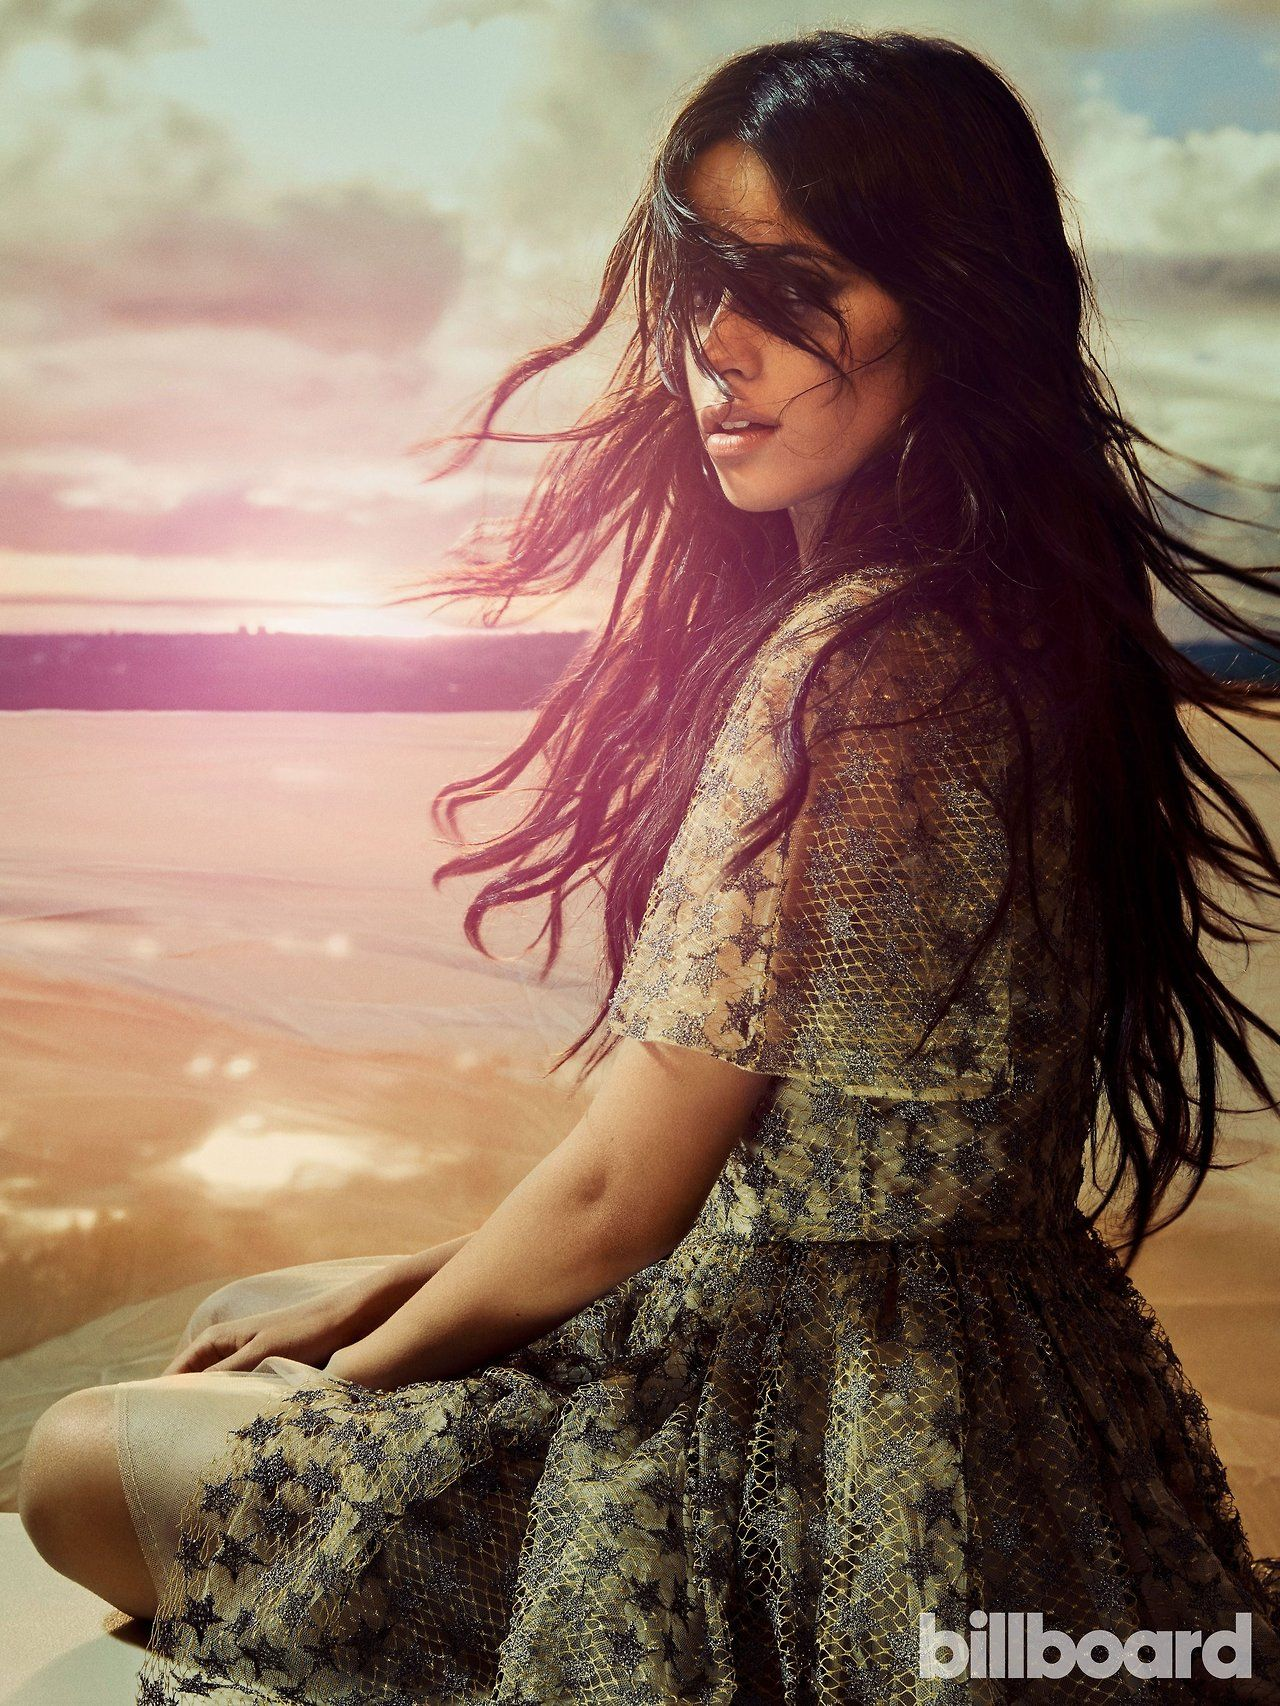 """ Camila Cabello photographed for Billboard. """